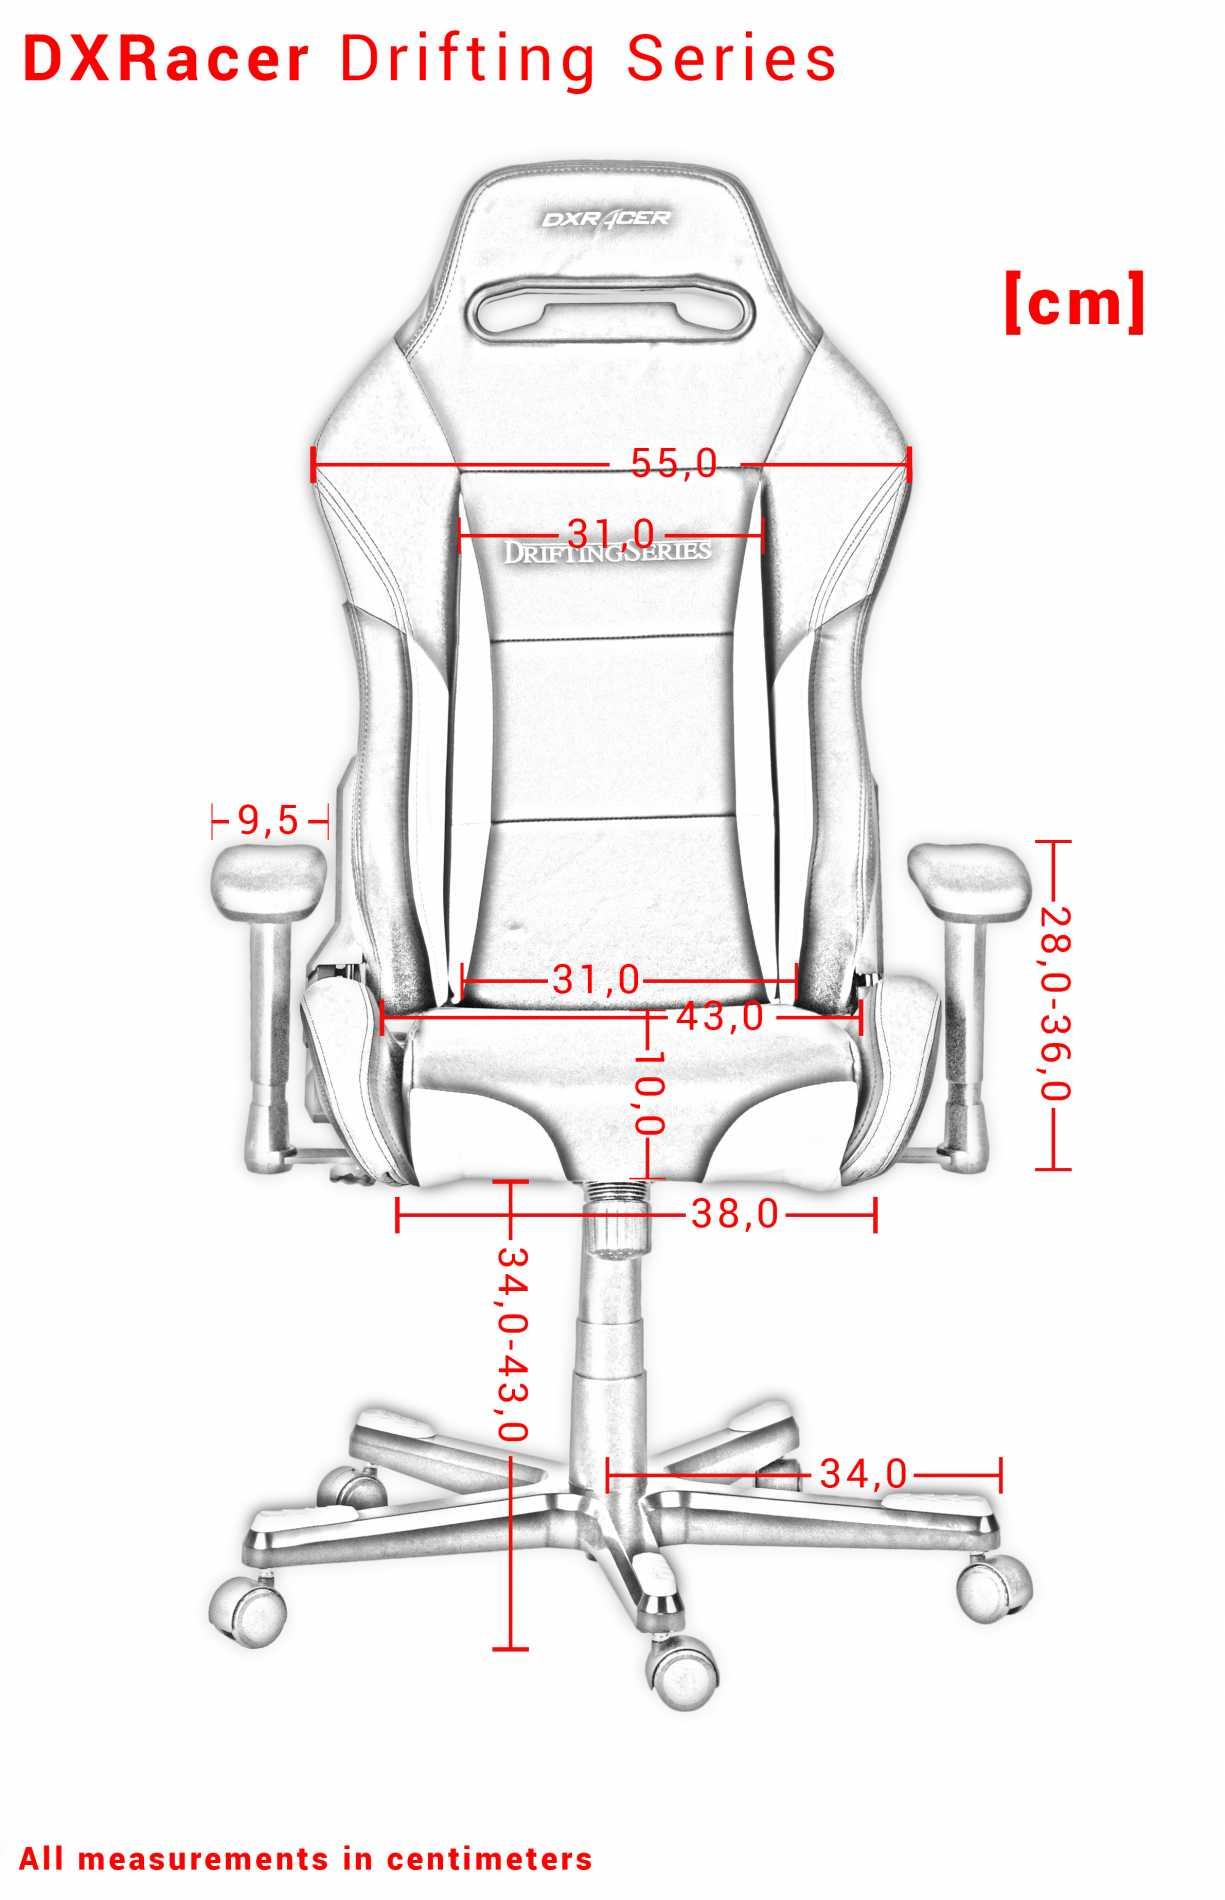 Кресло игровое DXRacer OH/DF73/N, Drifting, чёрное